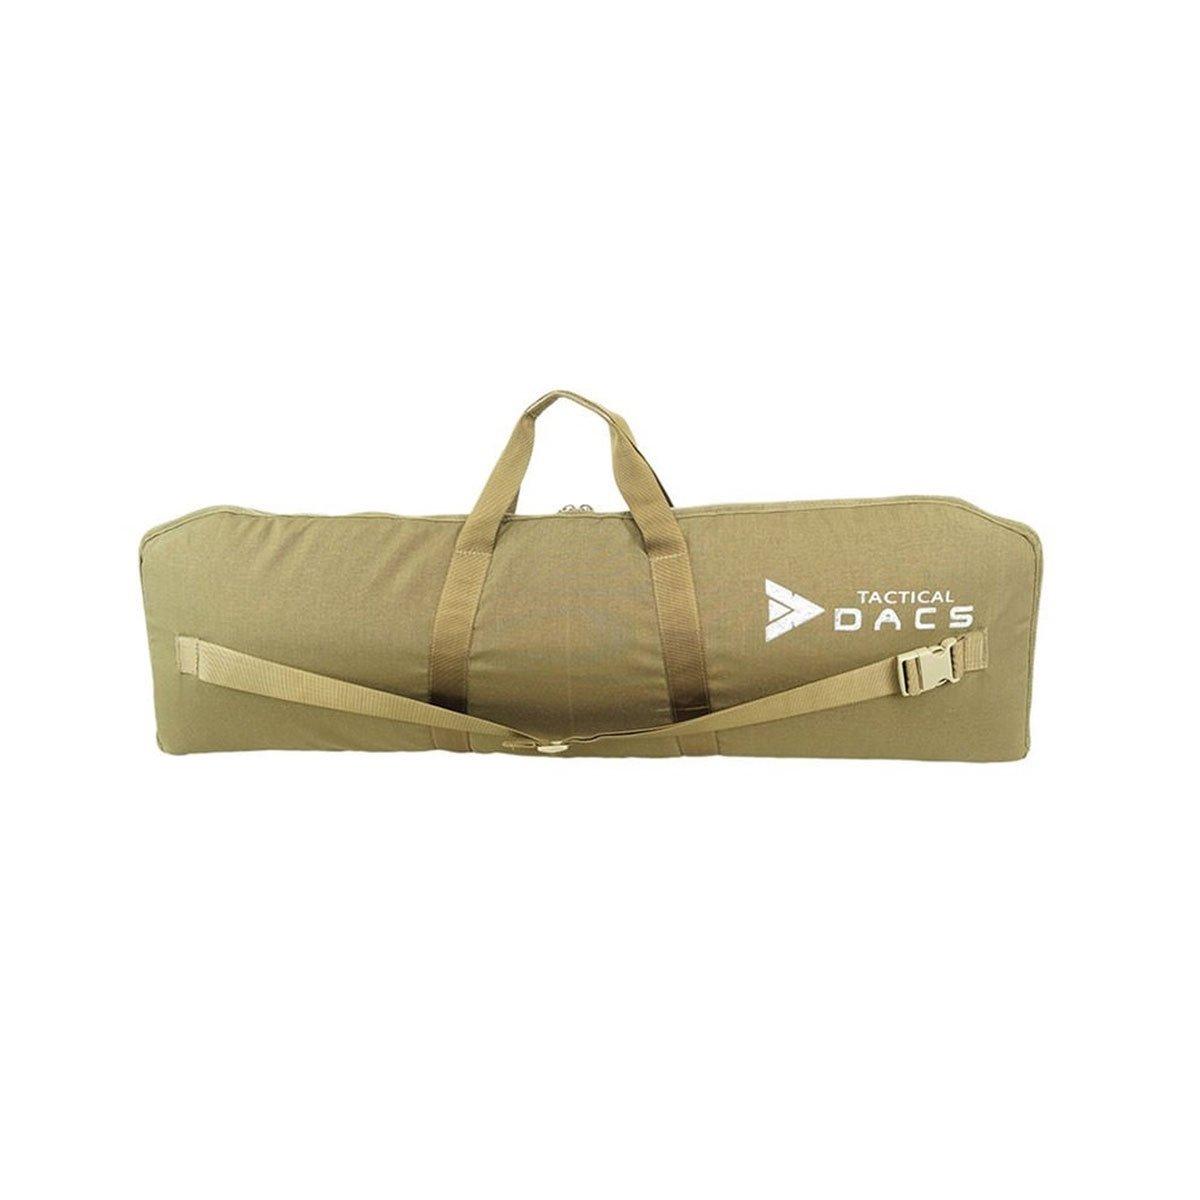 Case Tático Airsoft Dacs para Arma Longa 1,00m